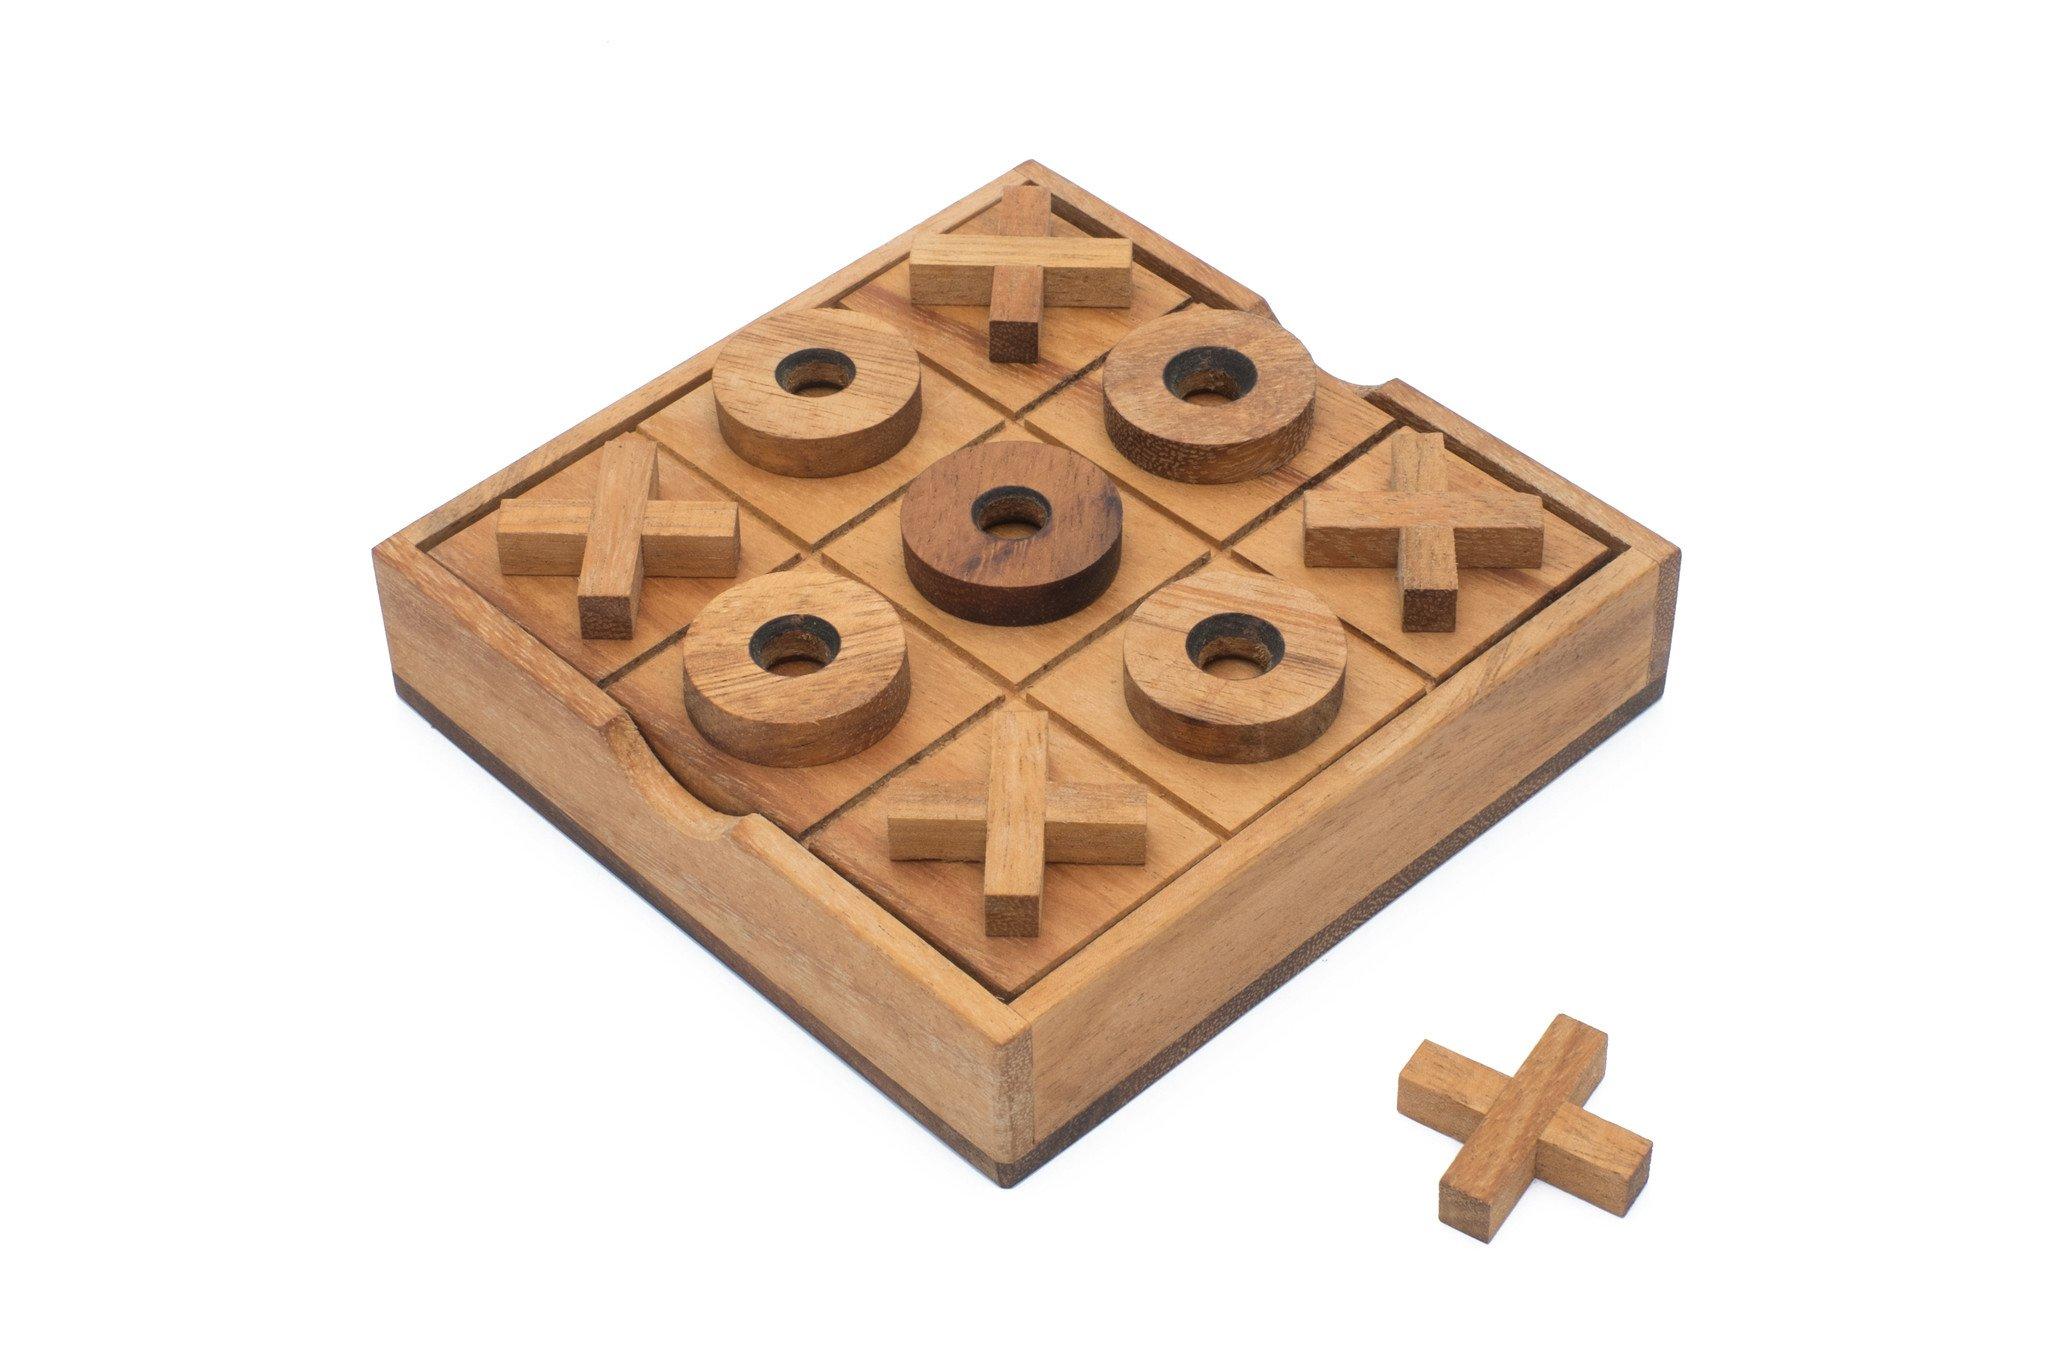 Wood Tic Tac Toe | Classic XOXO | Traditional Noughts & Crosses